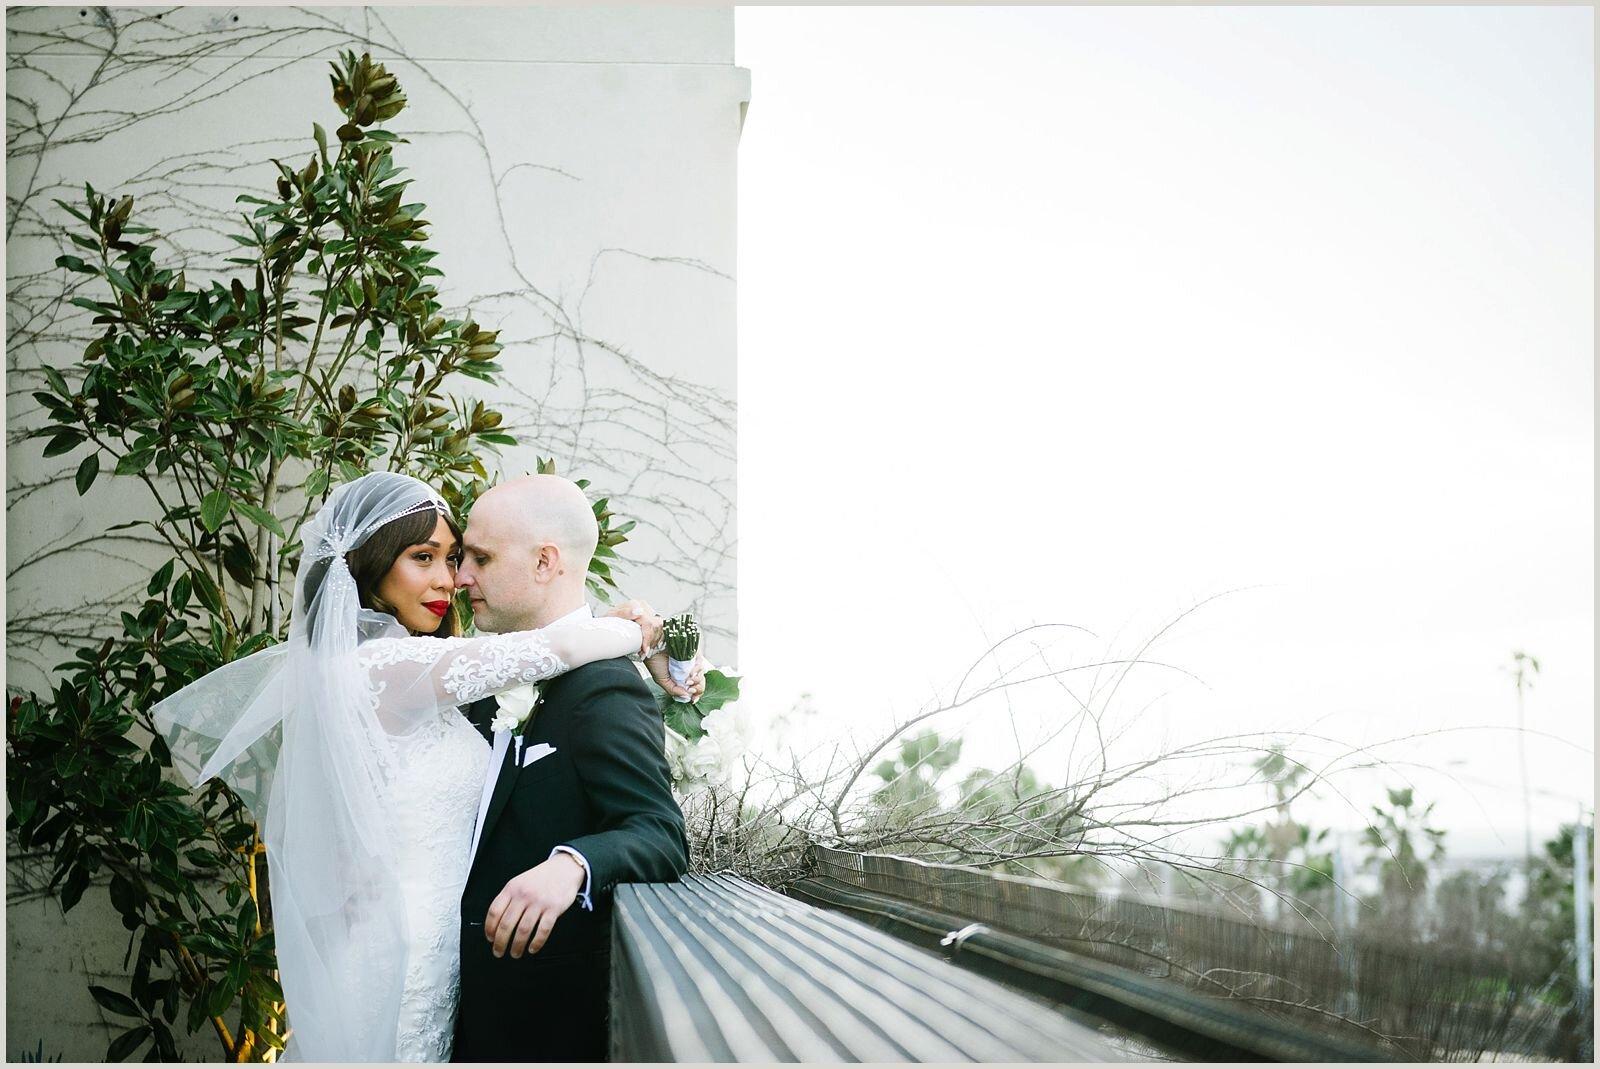 joseph_koprek_wedding_melbourne_the_prince_deck_0040.jpg